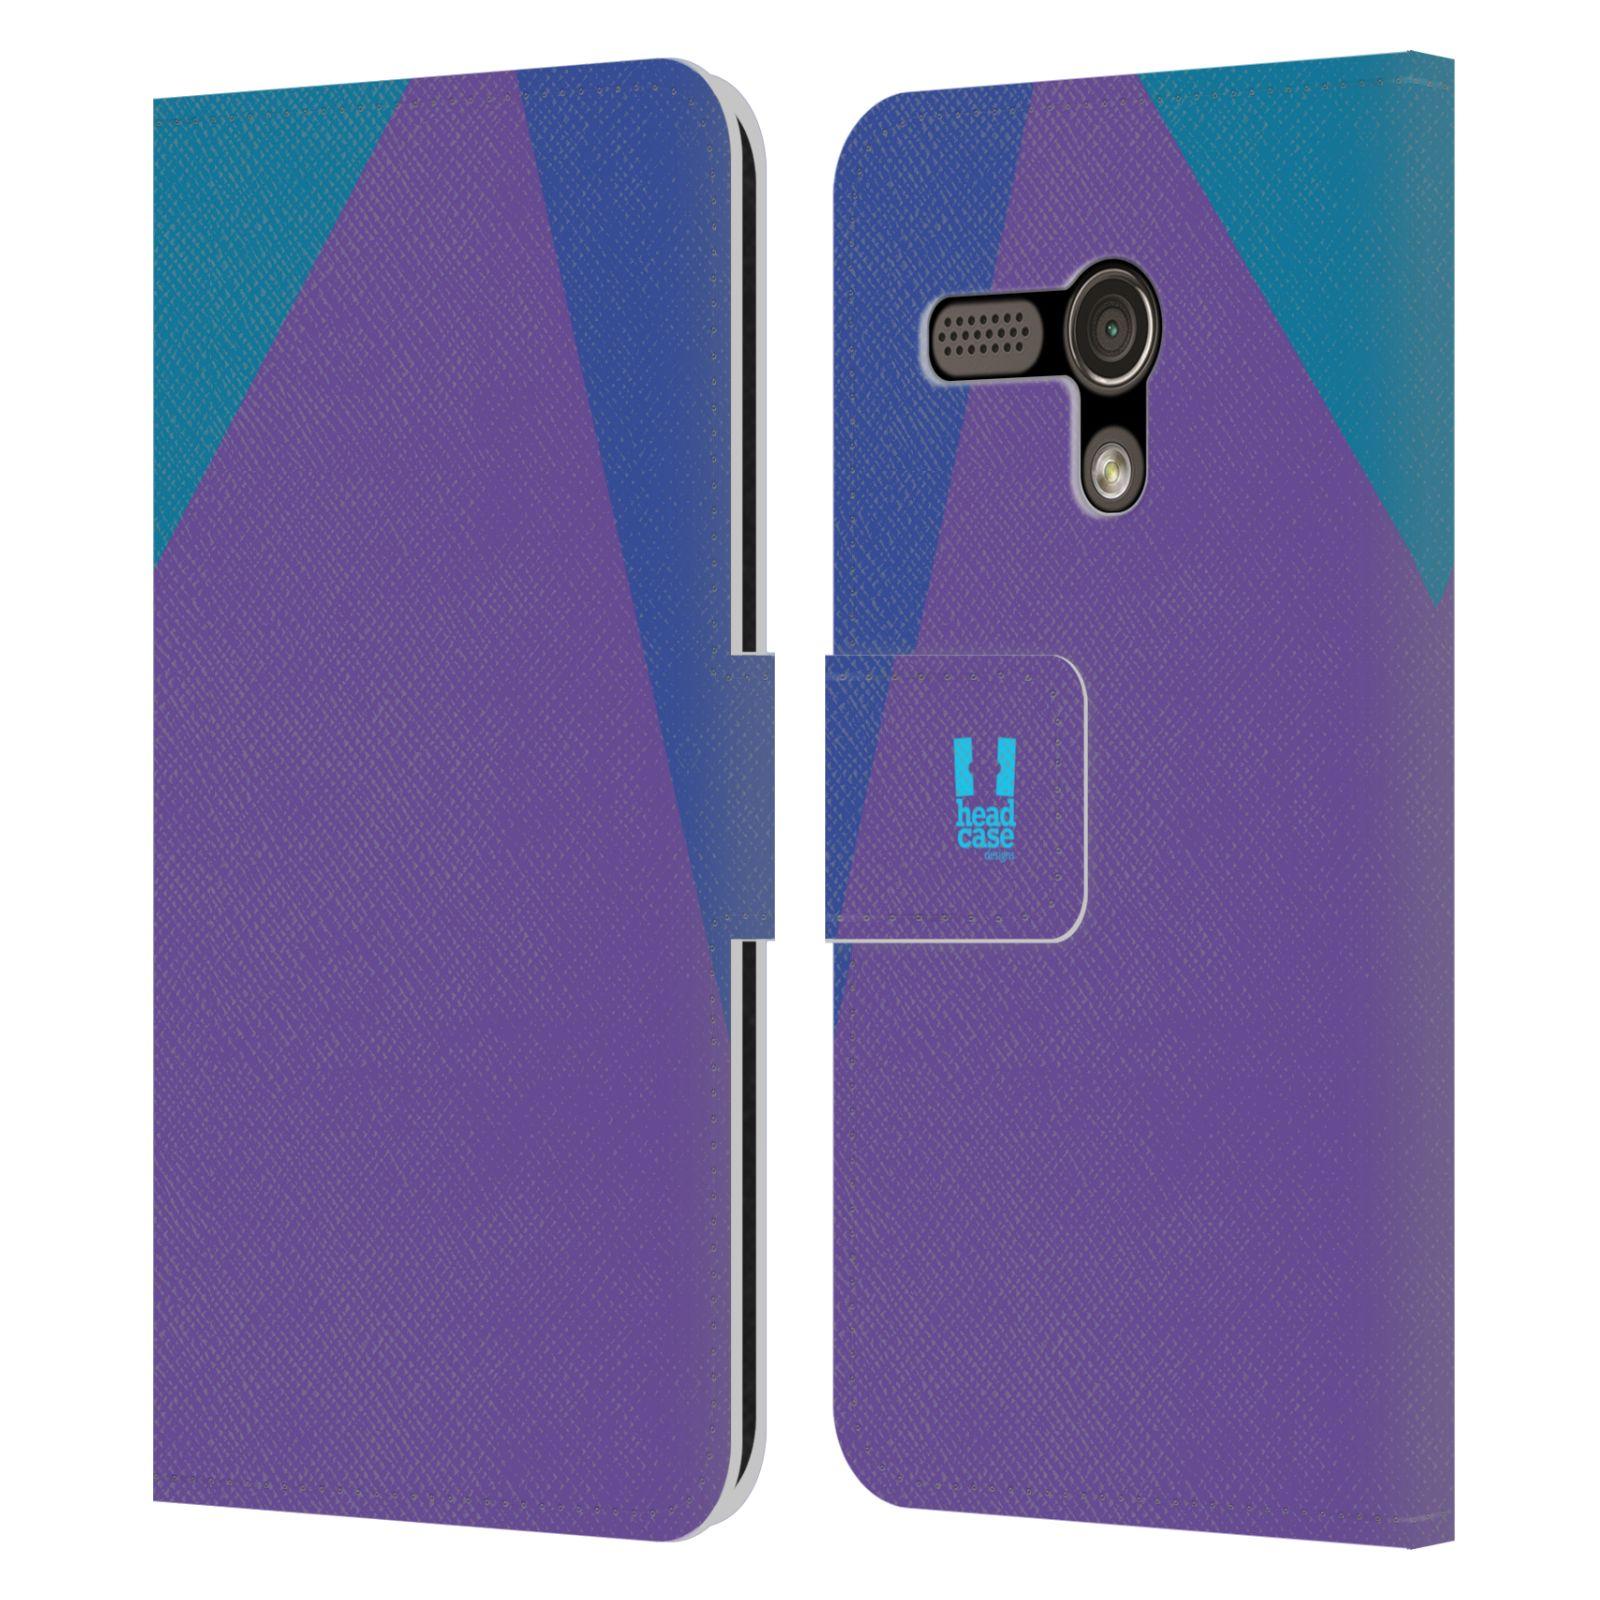 HEAD CASE Flipové pouzdro pro mobil Motorola MOTO G barevné tvary fialová feminine